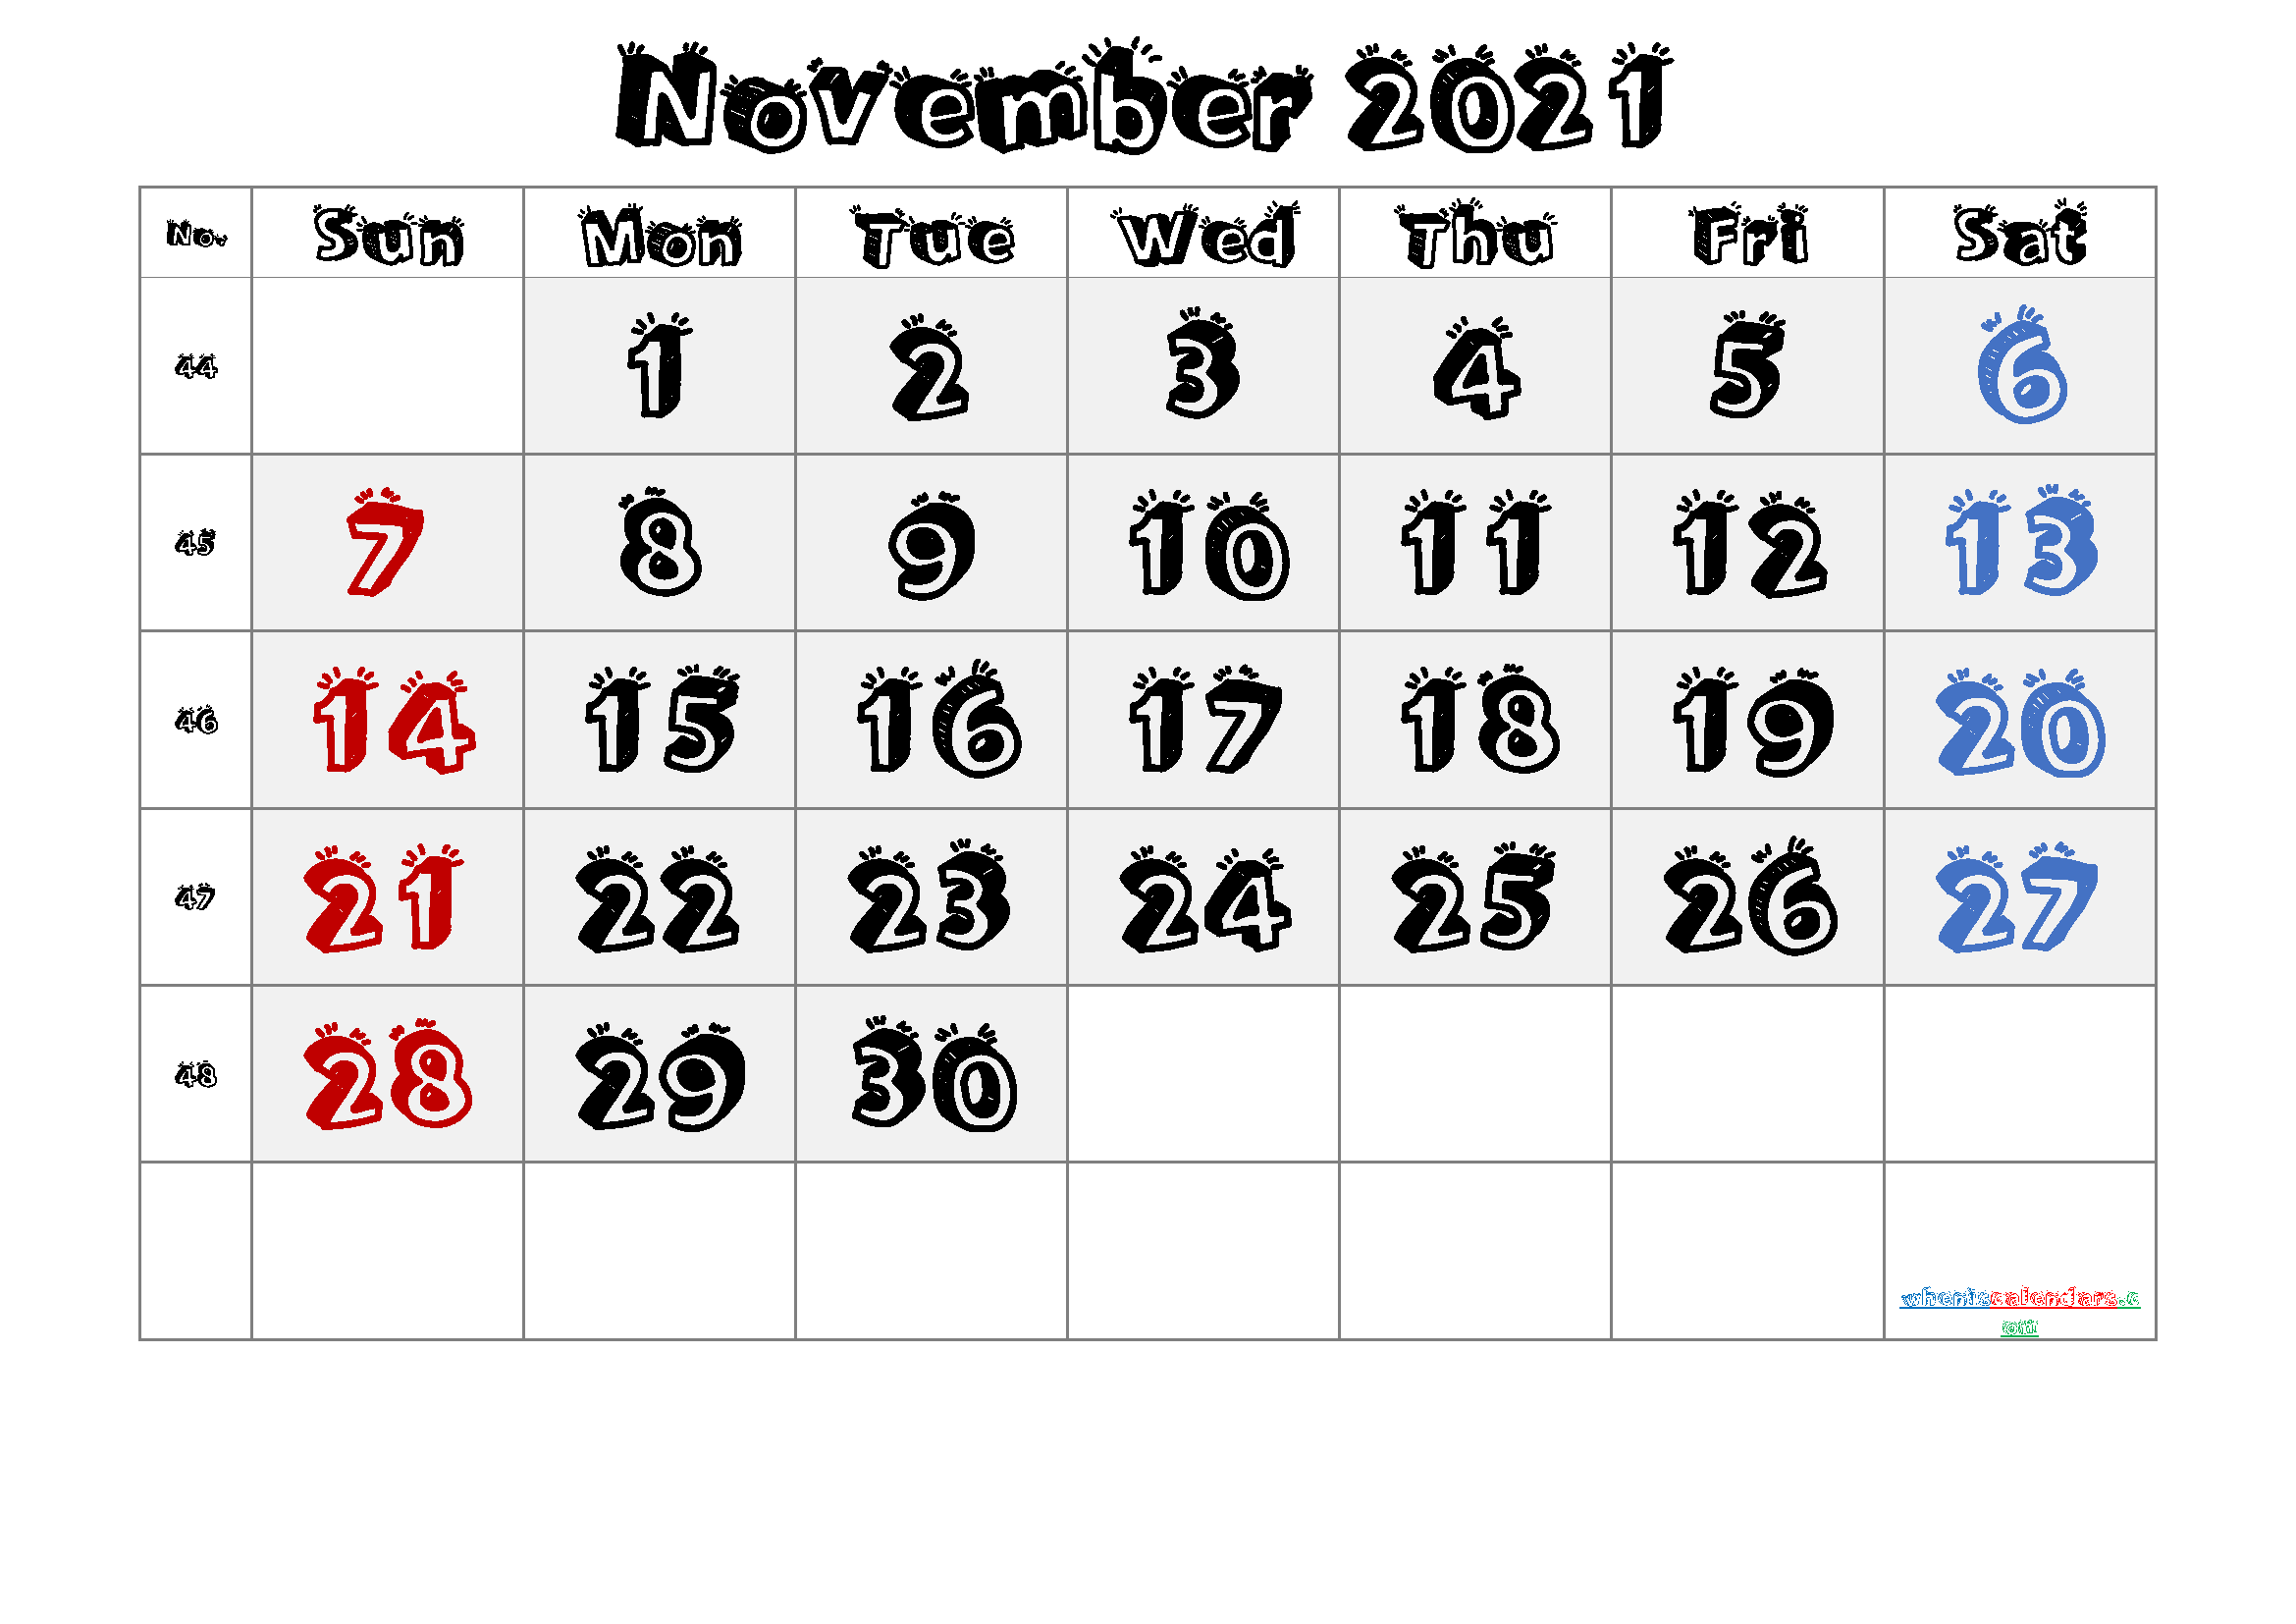 2021 November Free Printable Calendar